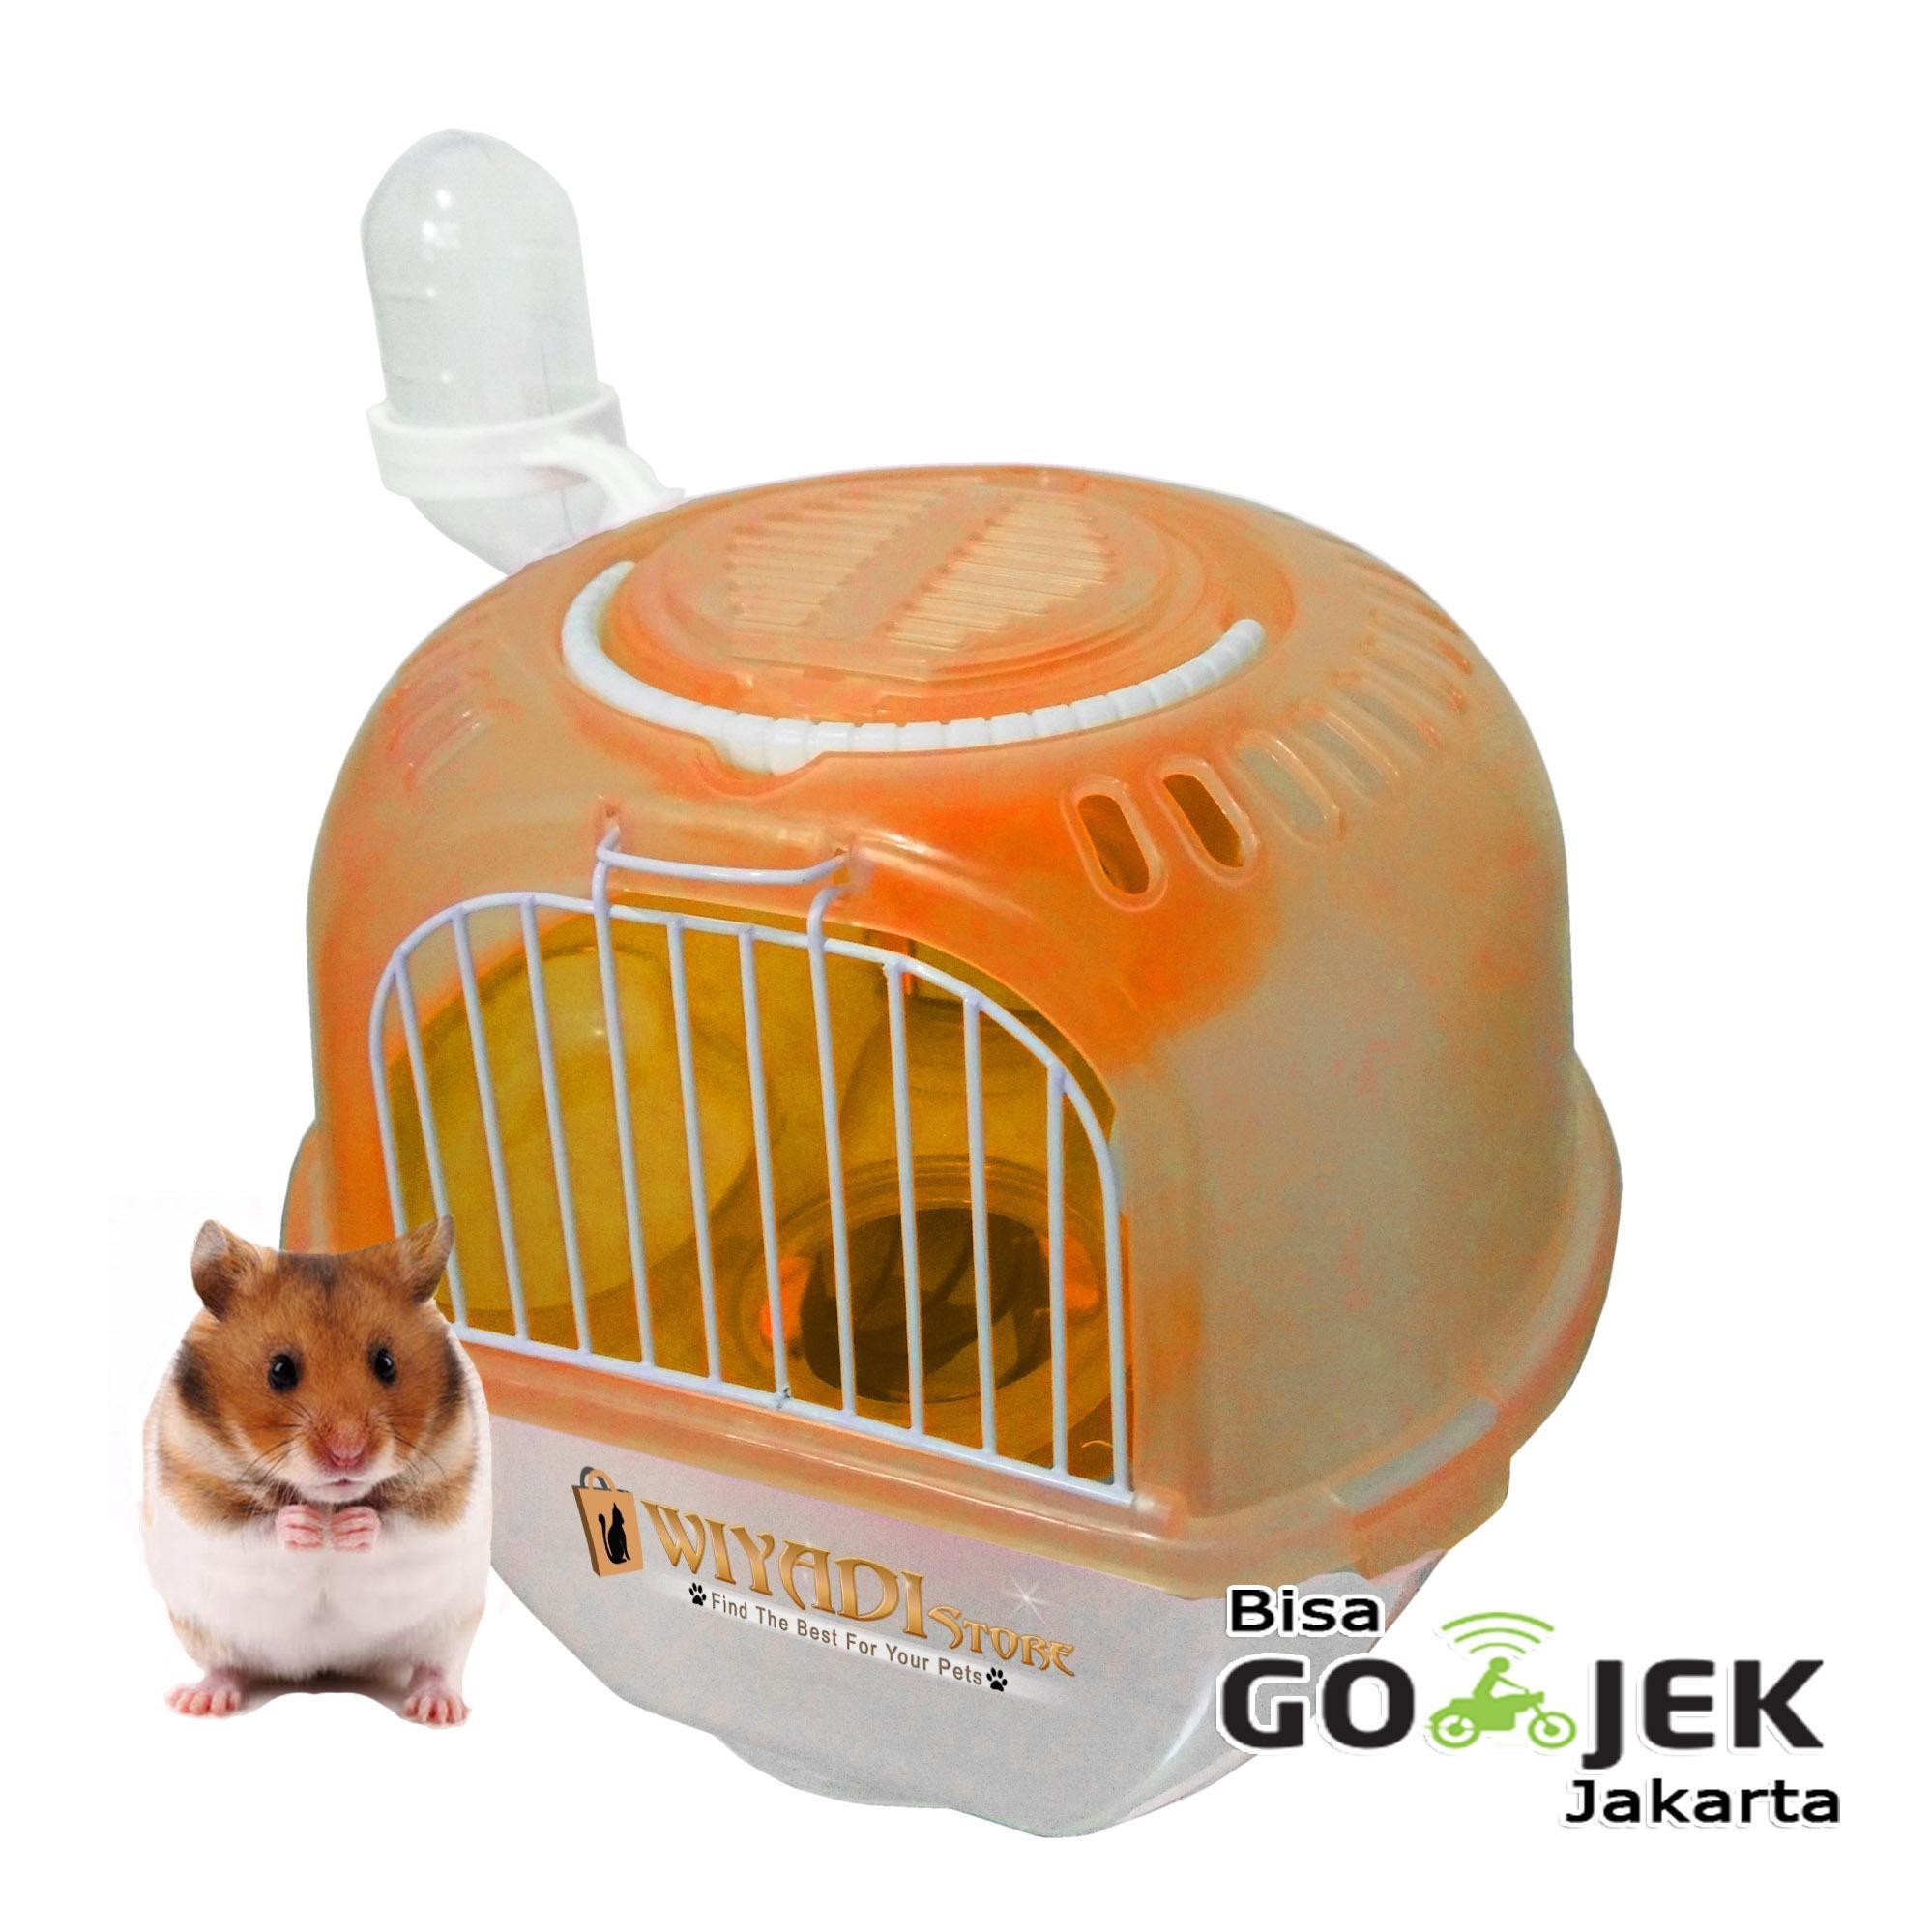 WiyadiStore - Kandang Hamster Travel Bag Model Apel - Orange